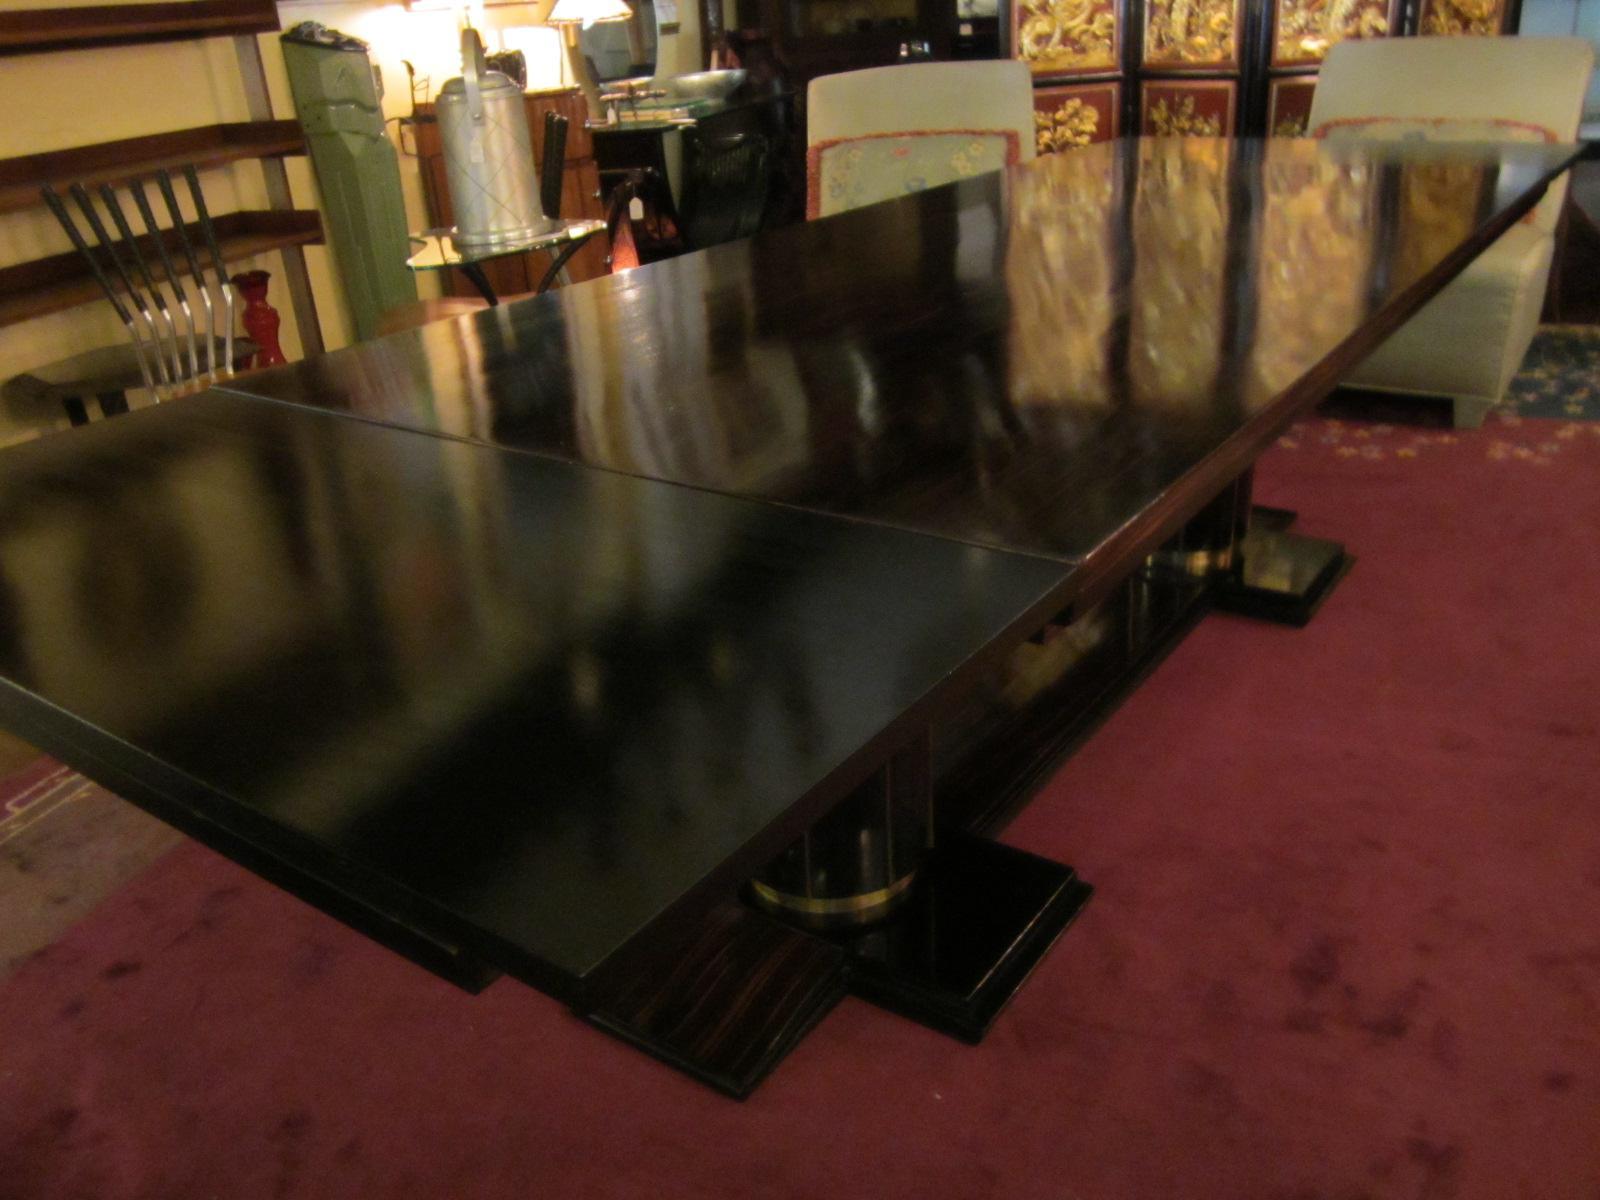 French Art Deco Macassar Table Attributed to Jules Leleu  : eecdb0cb f879 49ce 8ed7 39793d962222aspectfitampwidth640ampheight640 from www.chairish.com size 640 x 640 jpeg 36kB